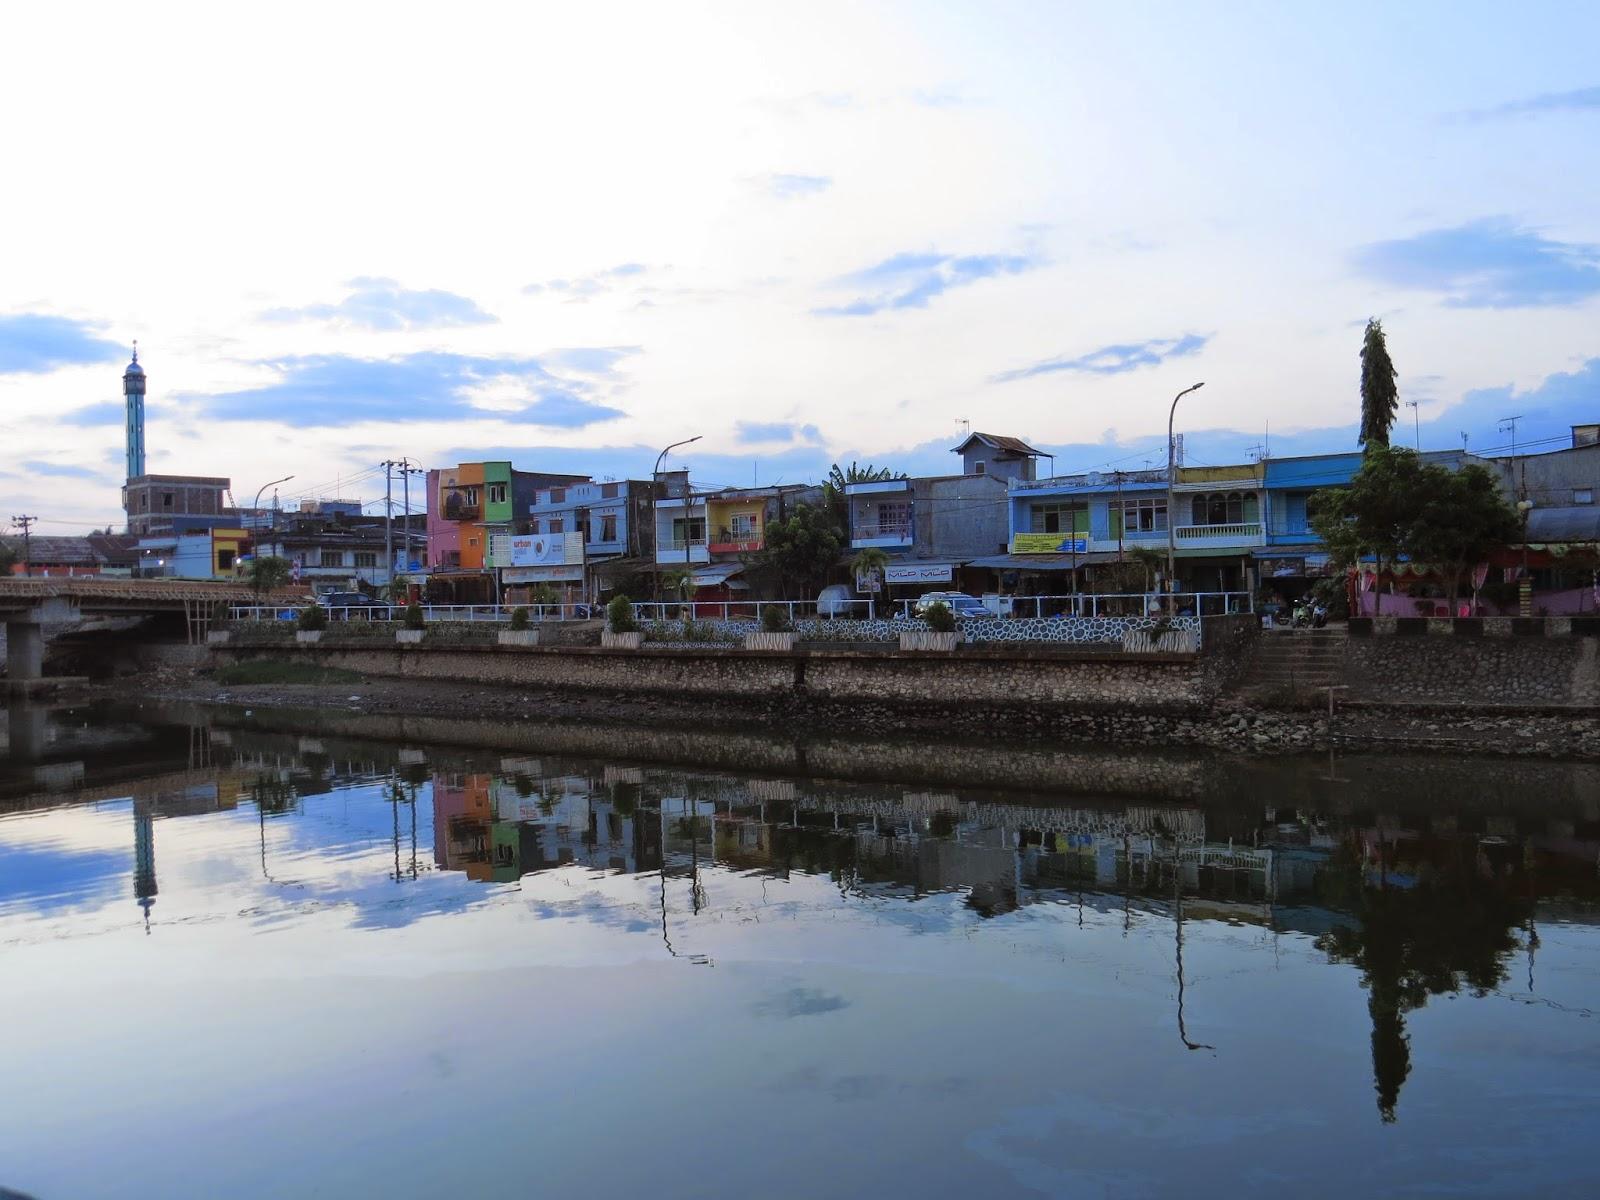 My Litle Town Pangkajene (Foto by Admin)